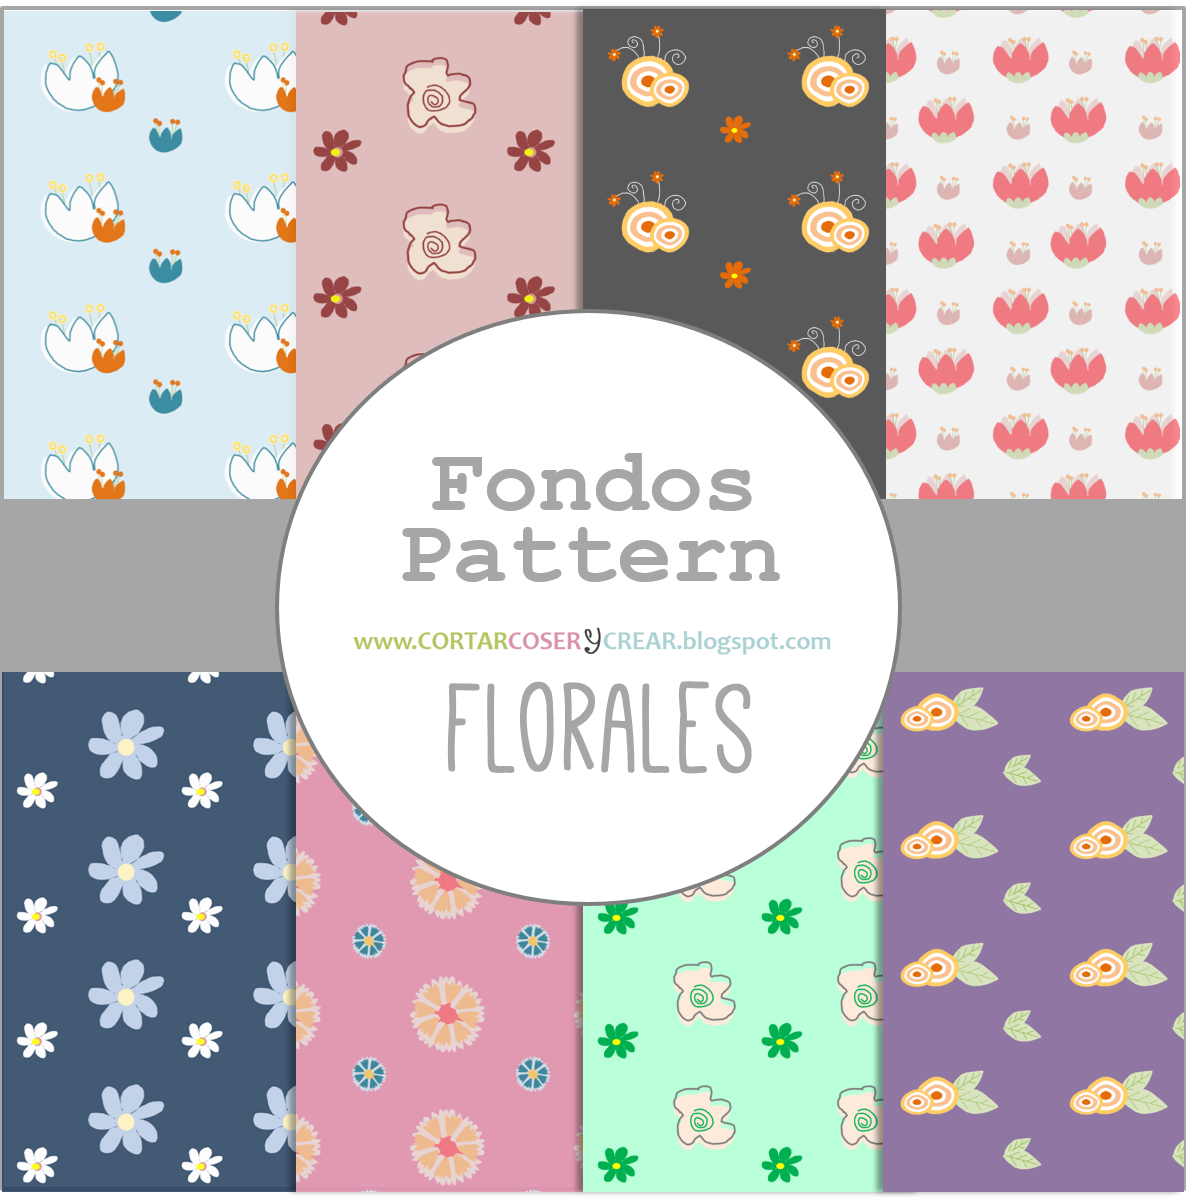 fondos recursos gratuitos flores pattern